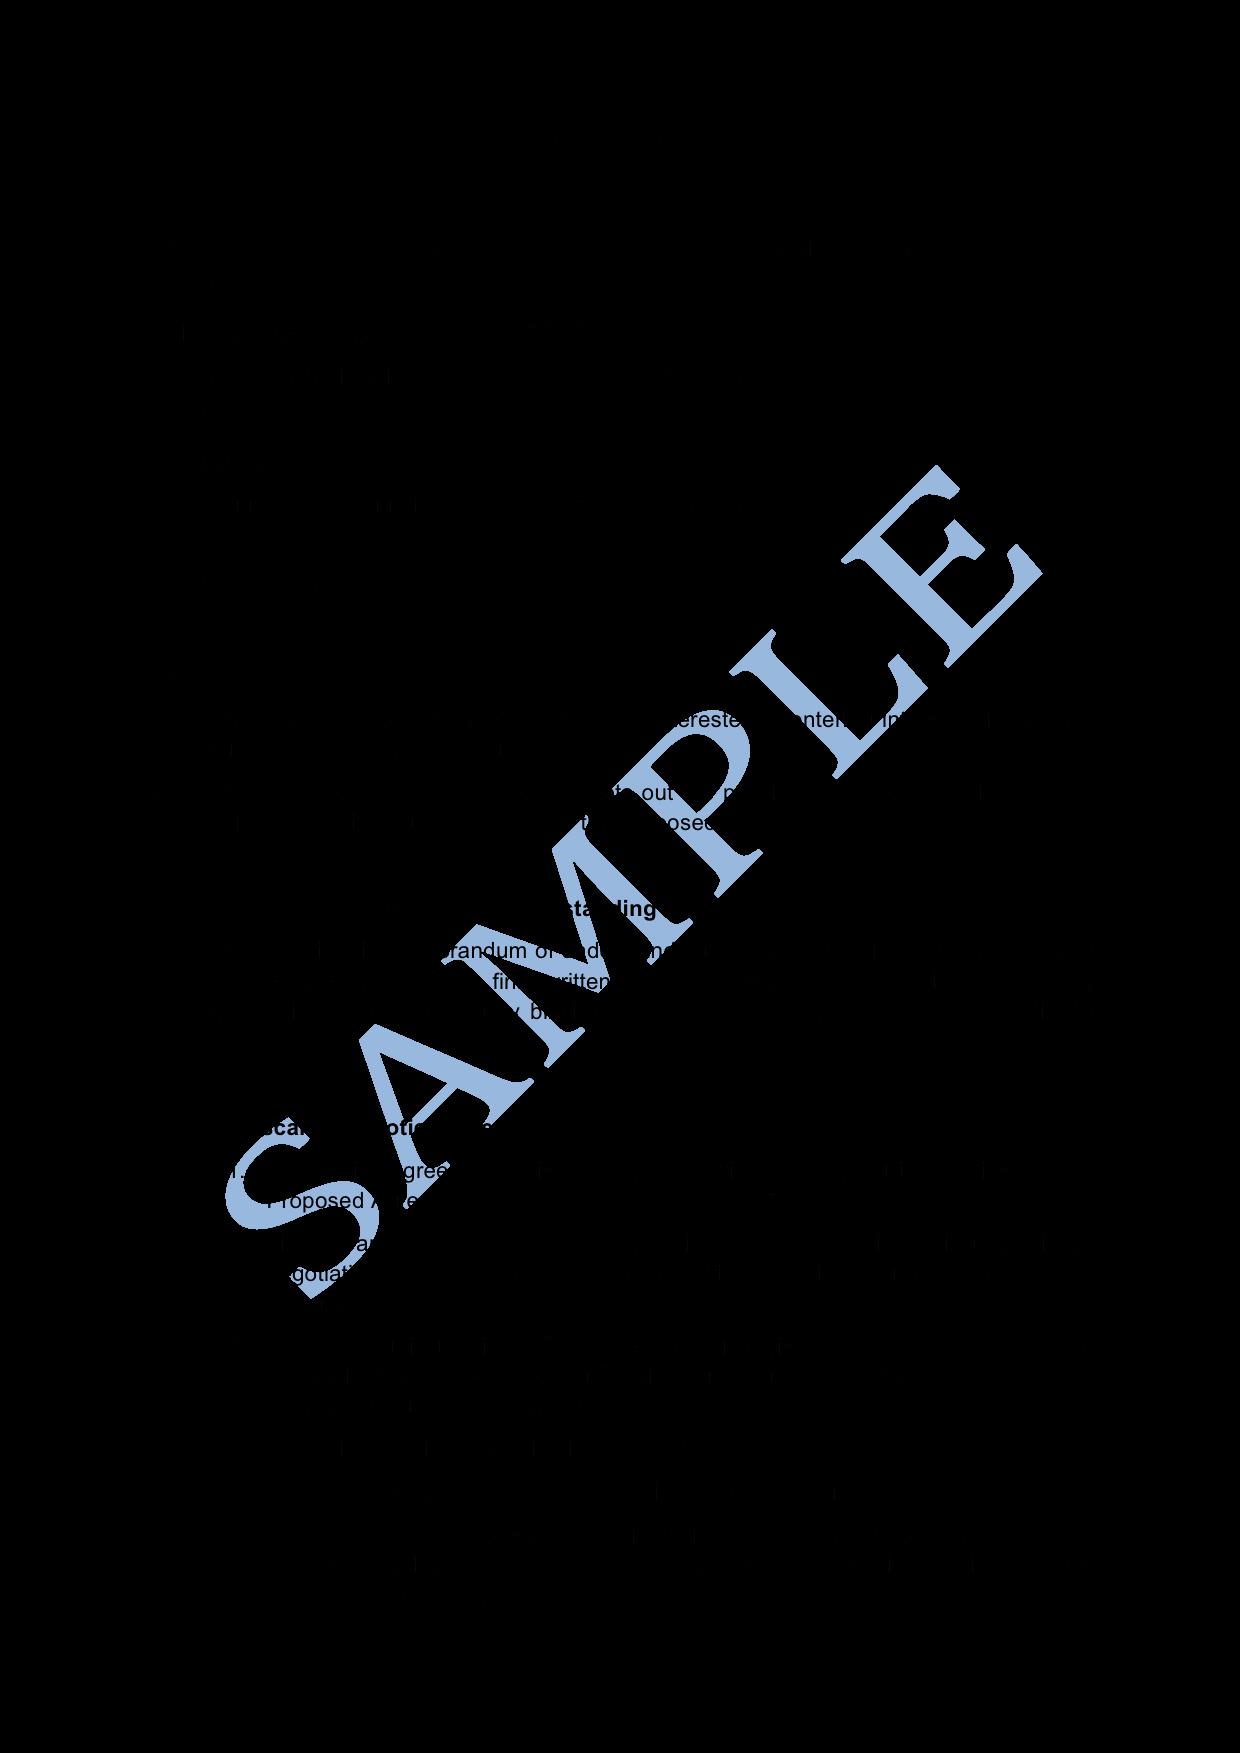 Memorandum Of Understanding Sample Elegant Memorandum Of Understanding Sample Lawpath